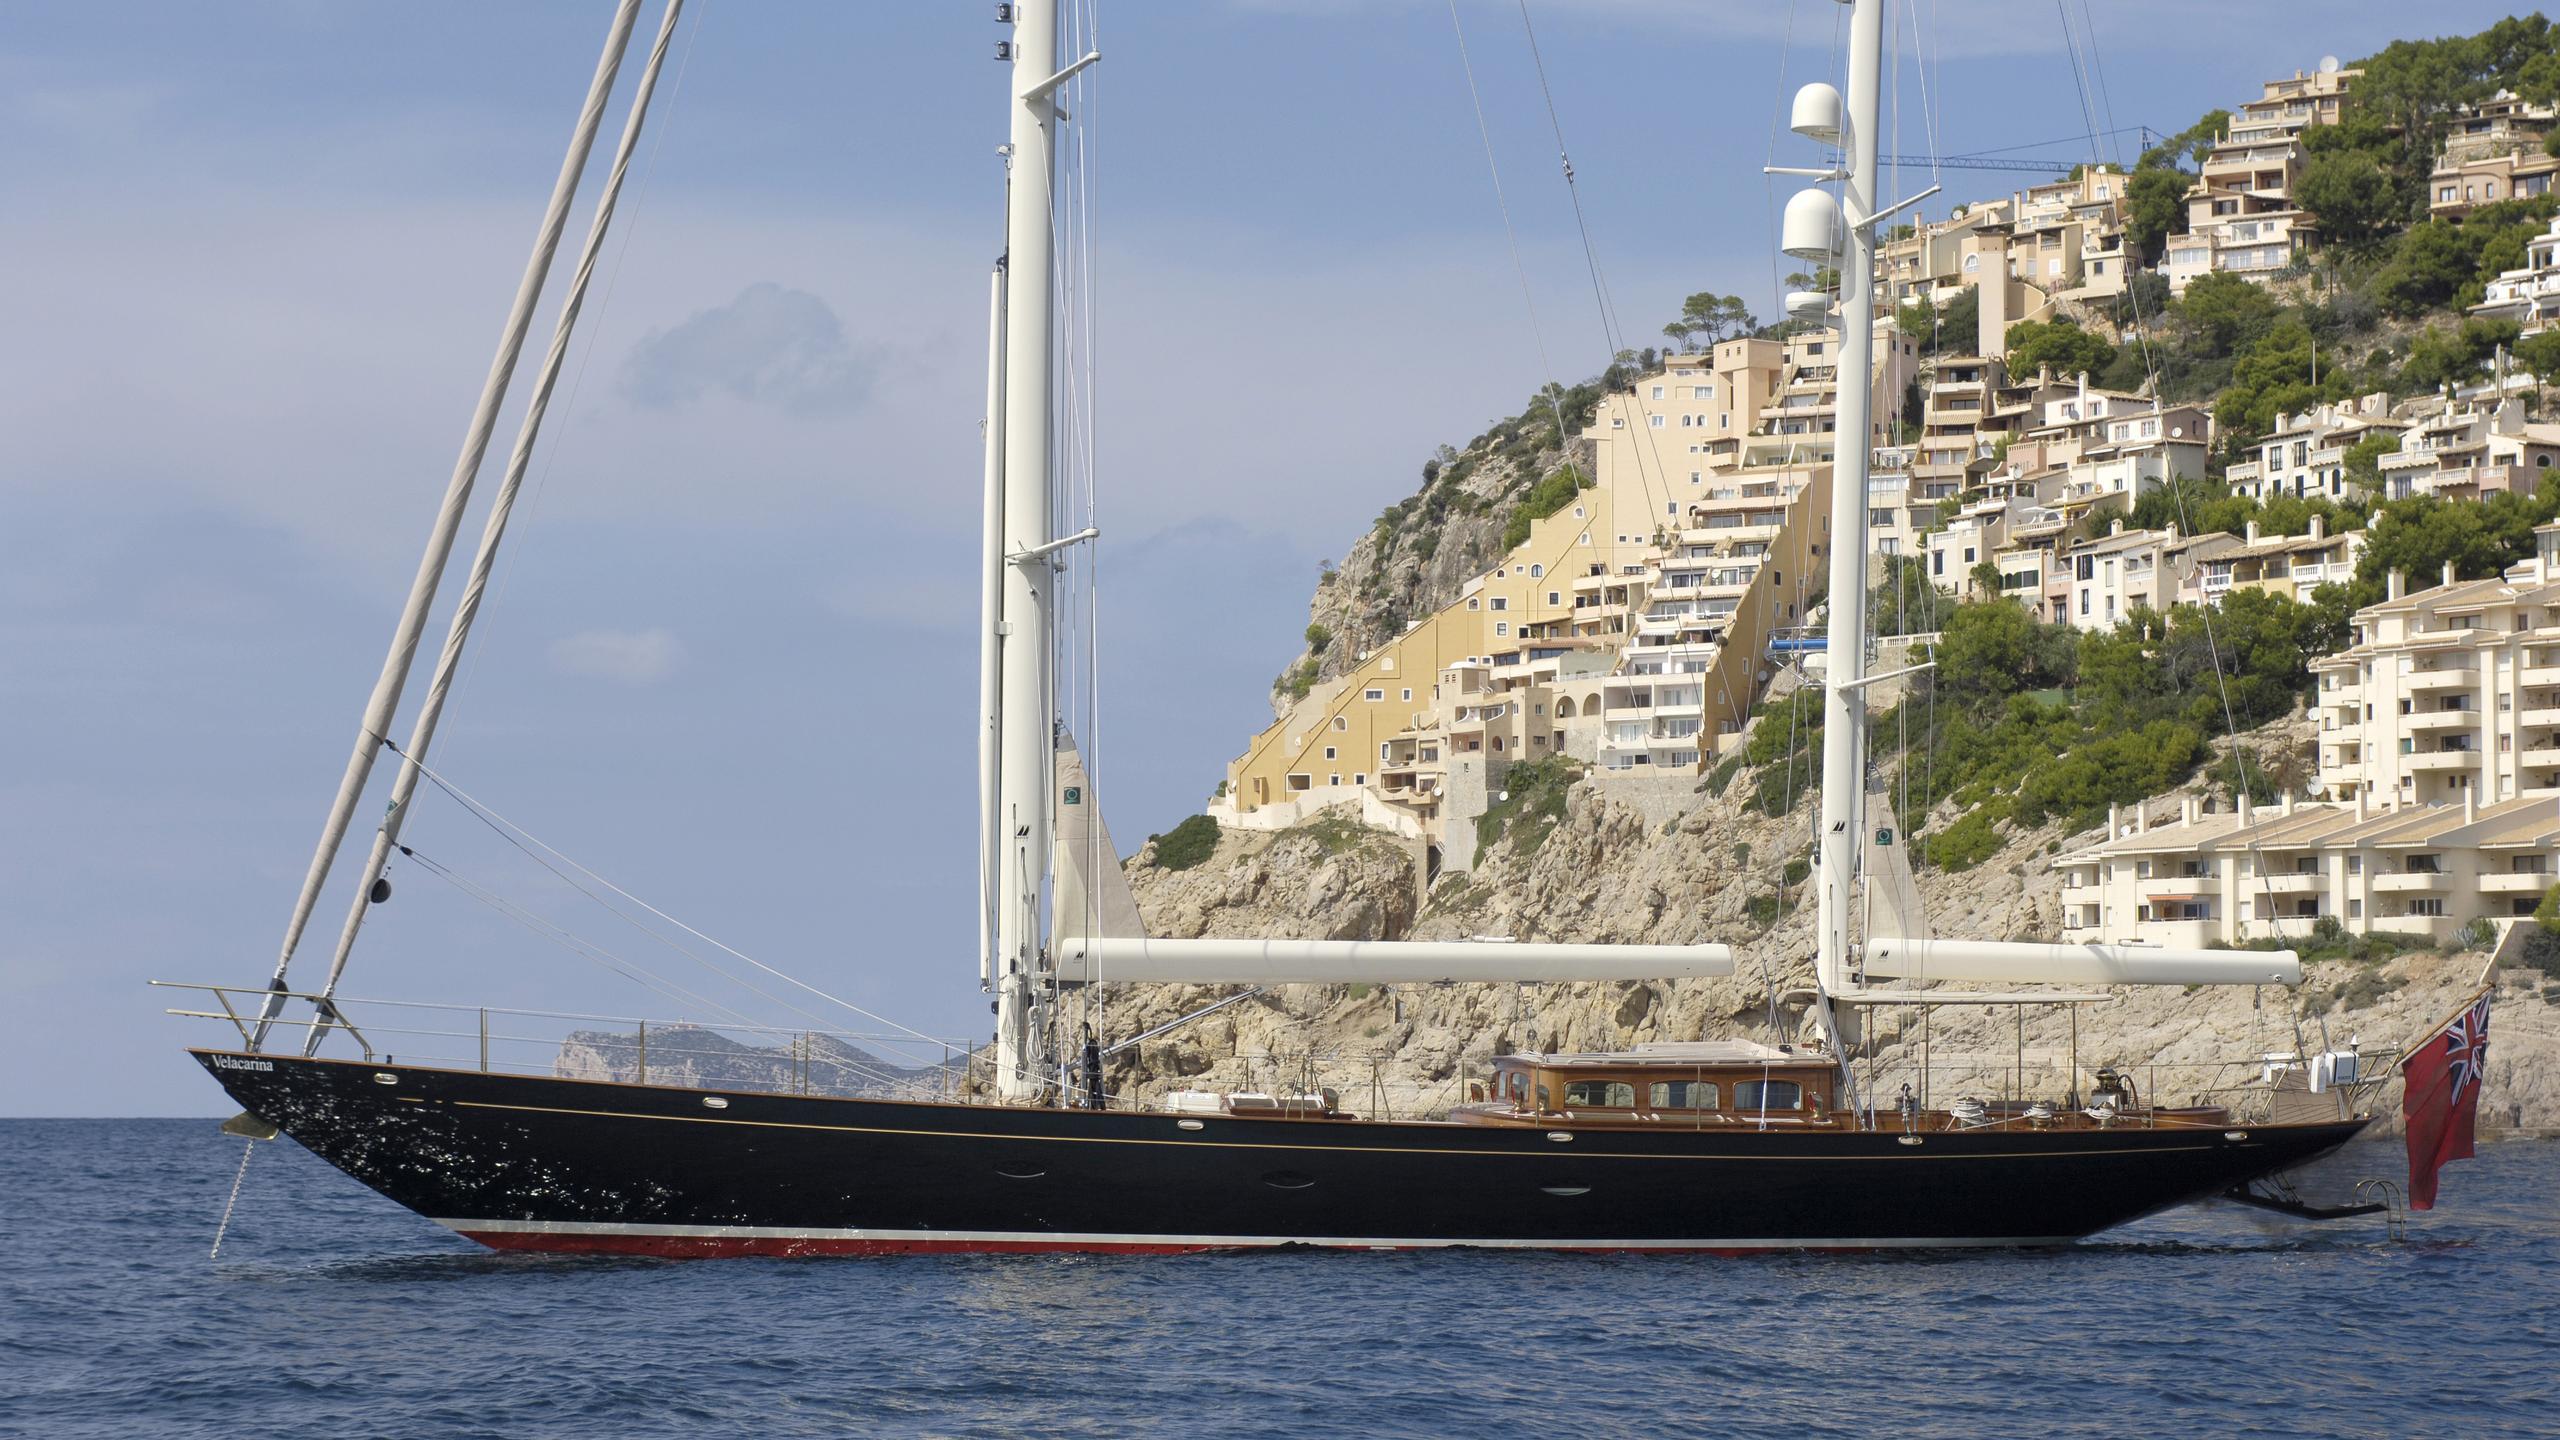 velacarina-yacht-at-anchor